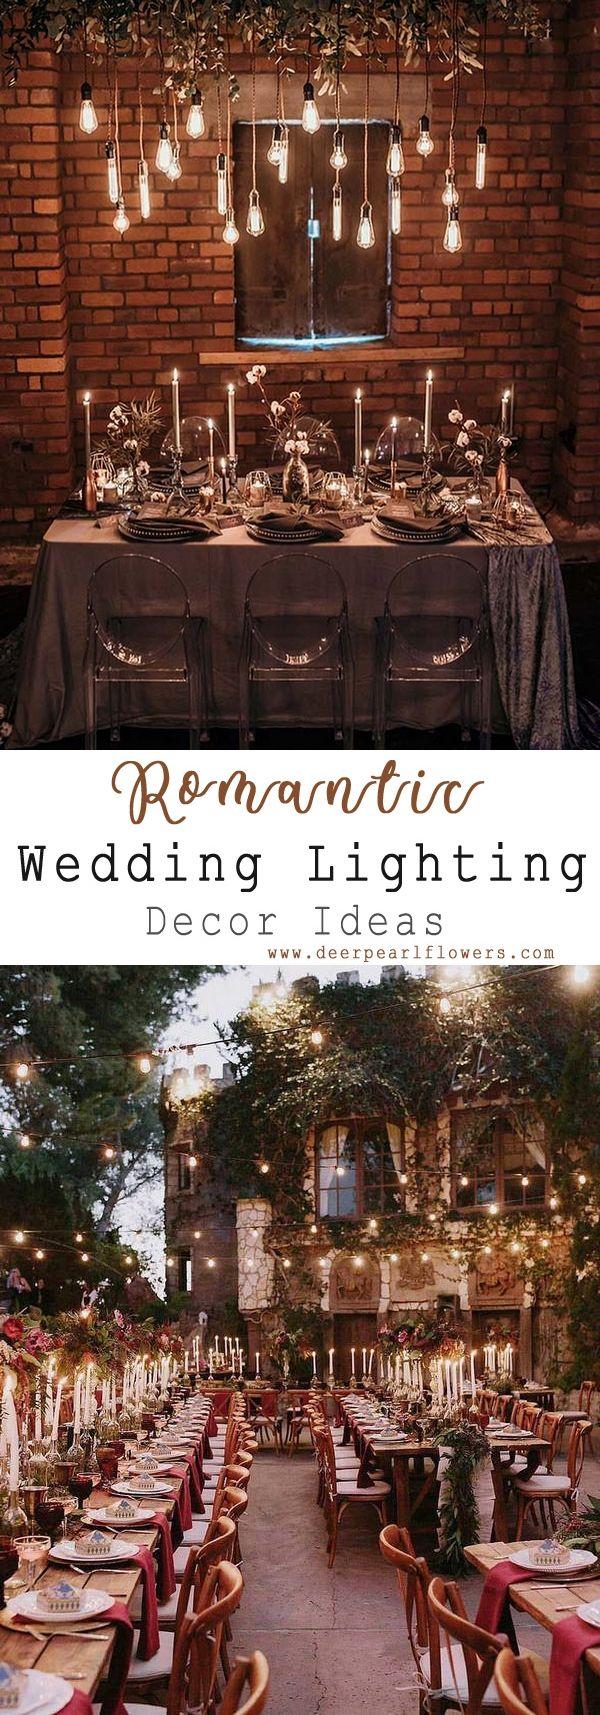 Wedding light decoration ideas  Top  Wedding Lighting Ideas You Can Steal  Wedding ideas